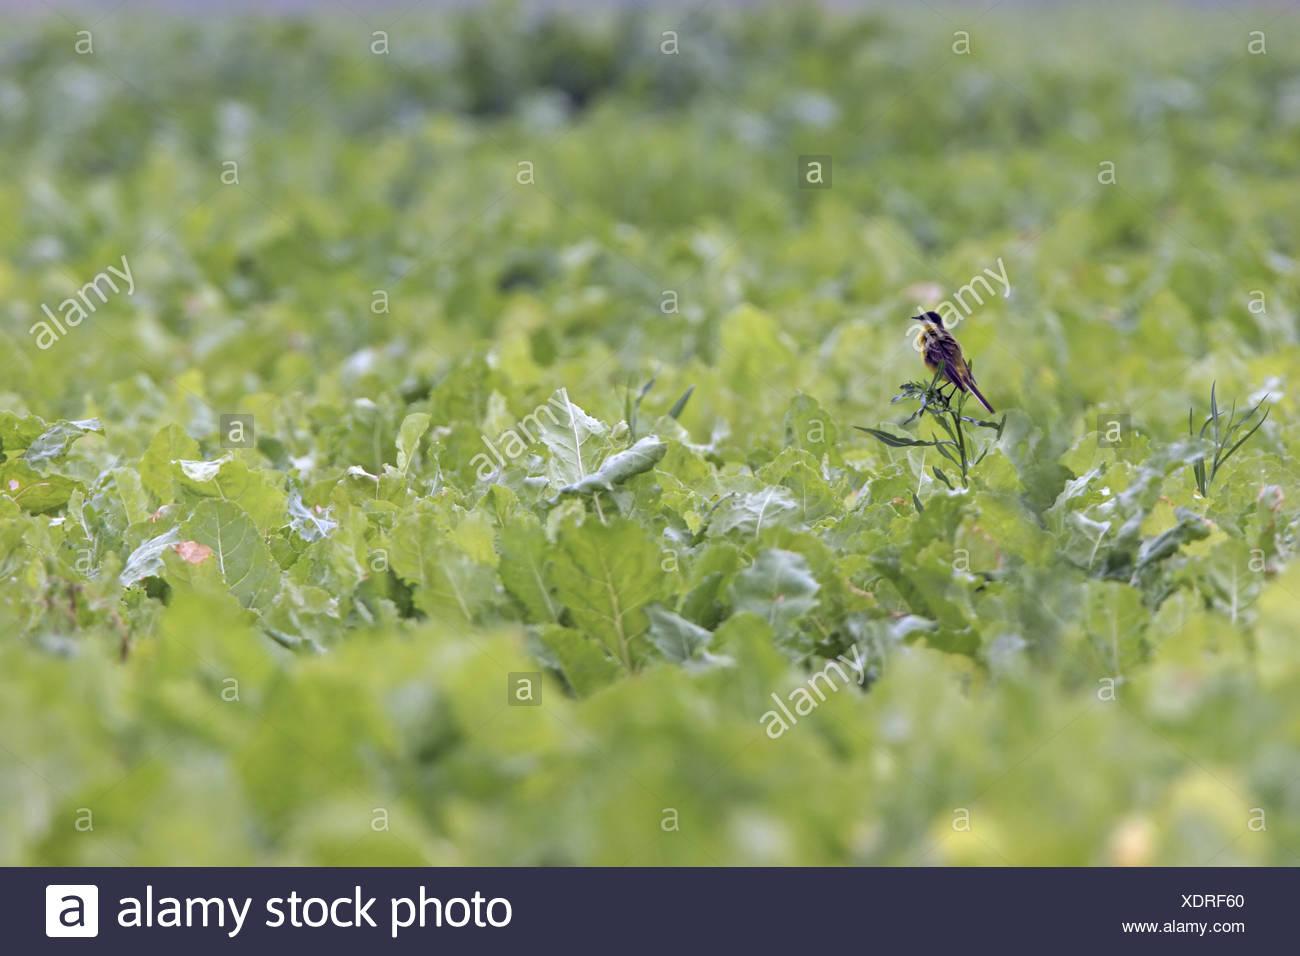 Ashy-headed Wagtail, Yellow wagtail (Motacilla flava cinereocapilla), sitting in vegetable field, Italy, Apulia, Pulia - Stock Image